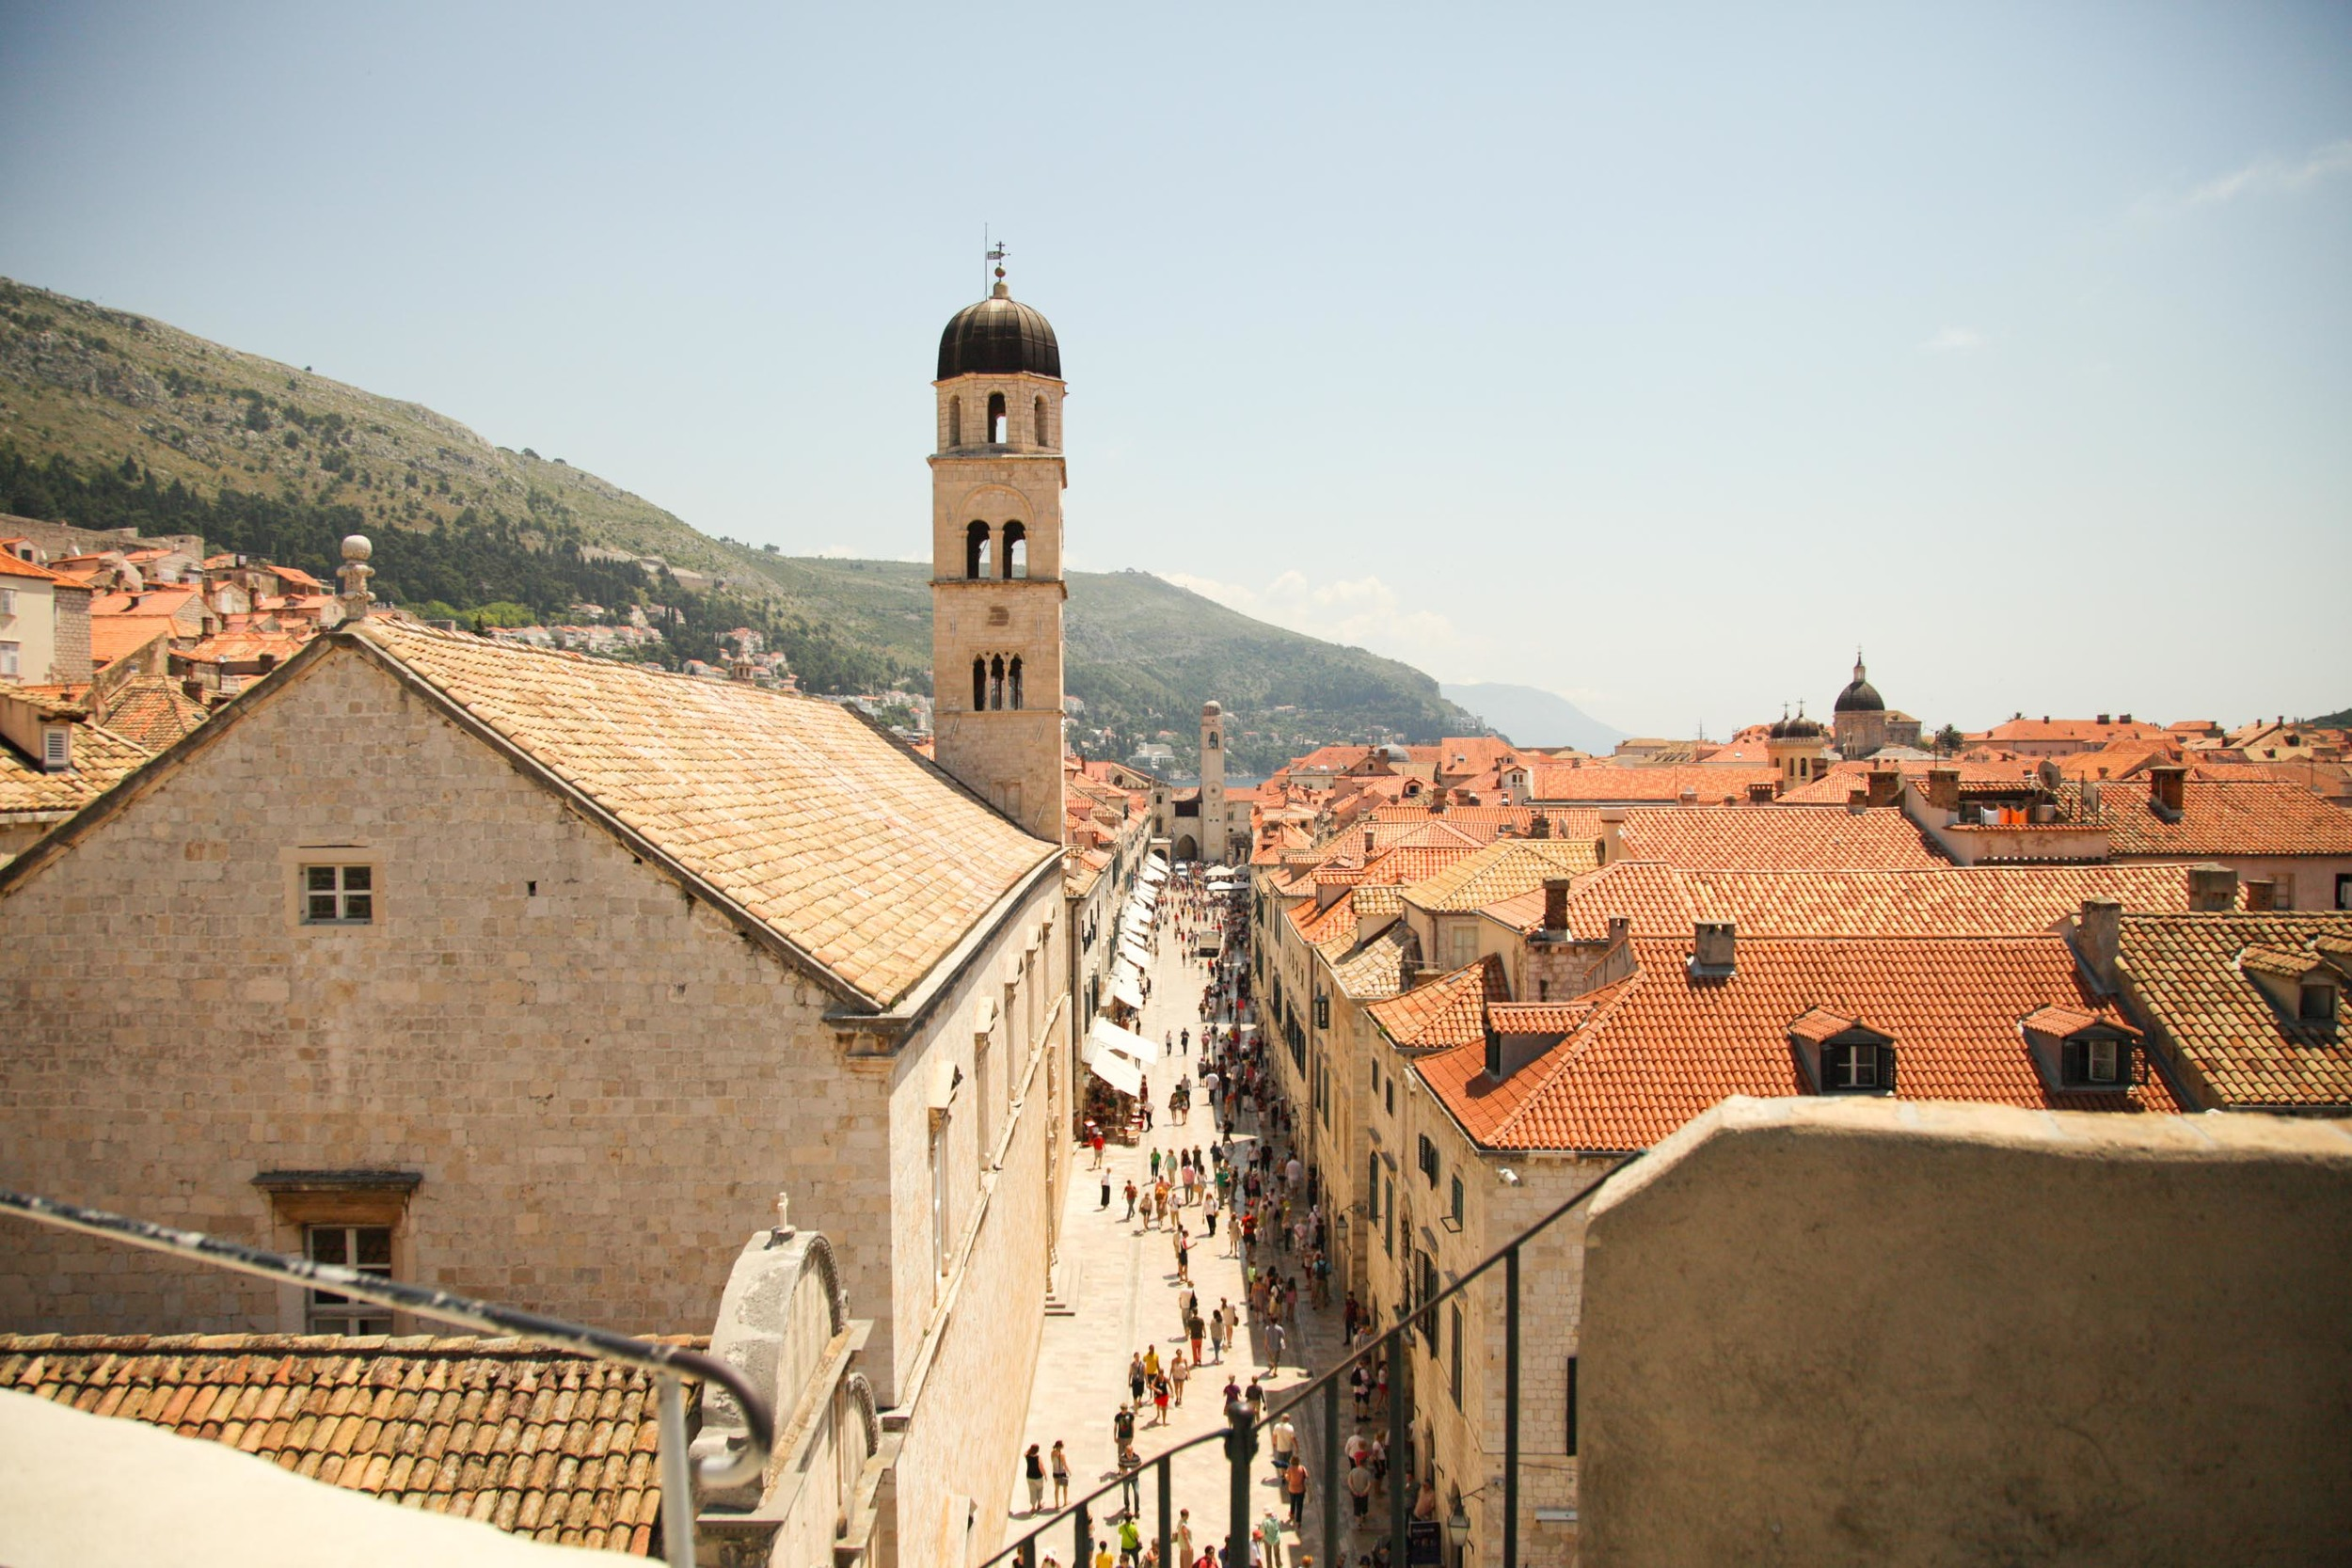 Just a random stunning photo of the stunning Dubrovnik.